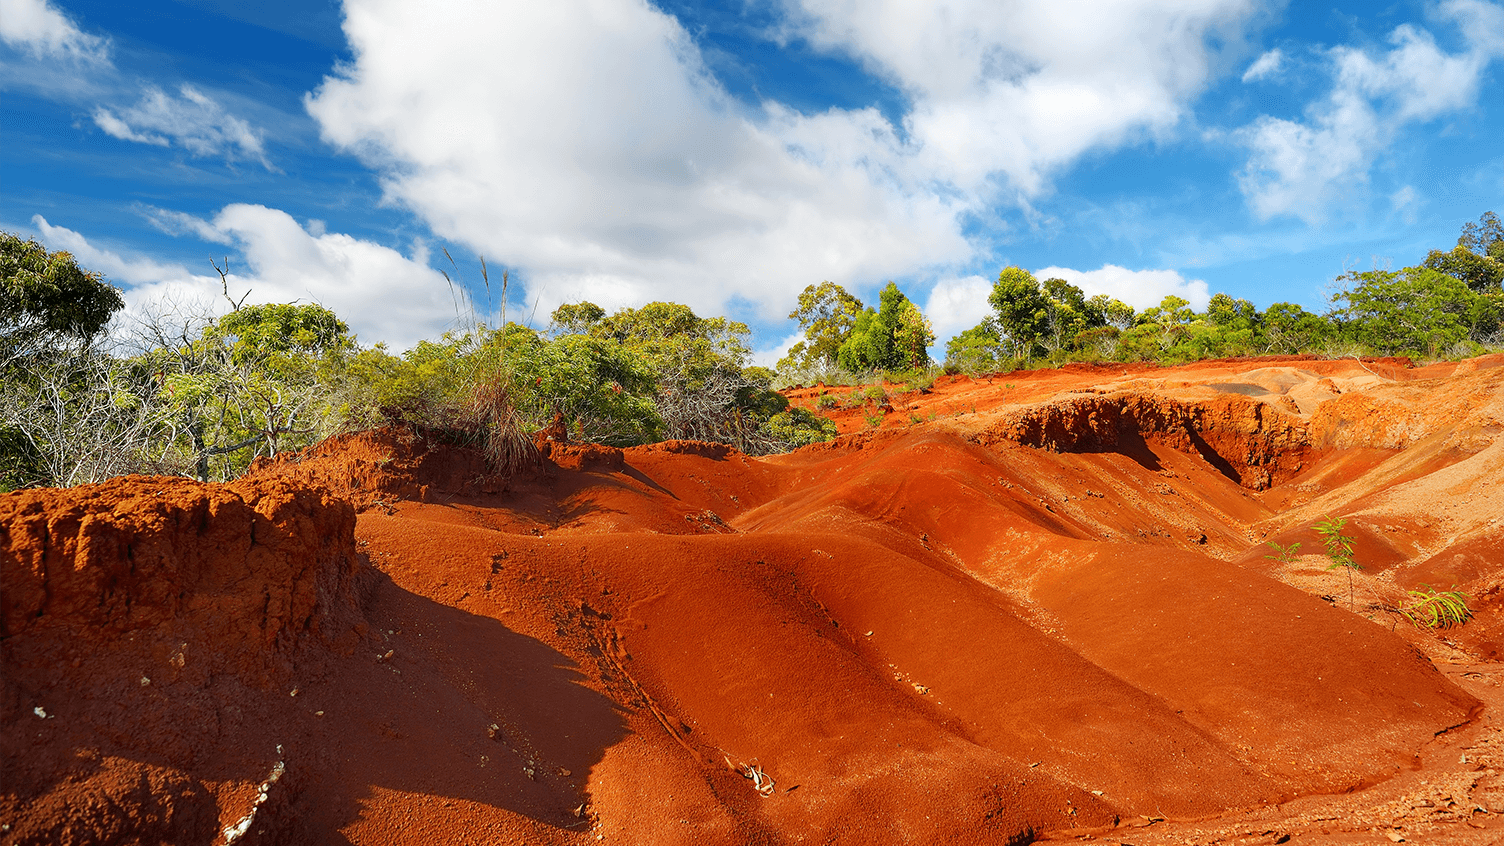 Hawaiian Red Dirt